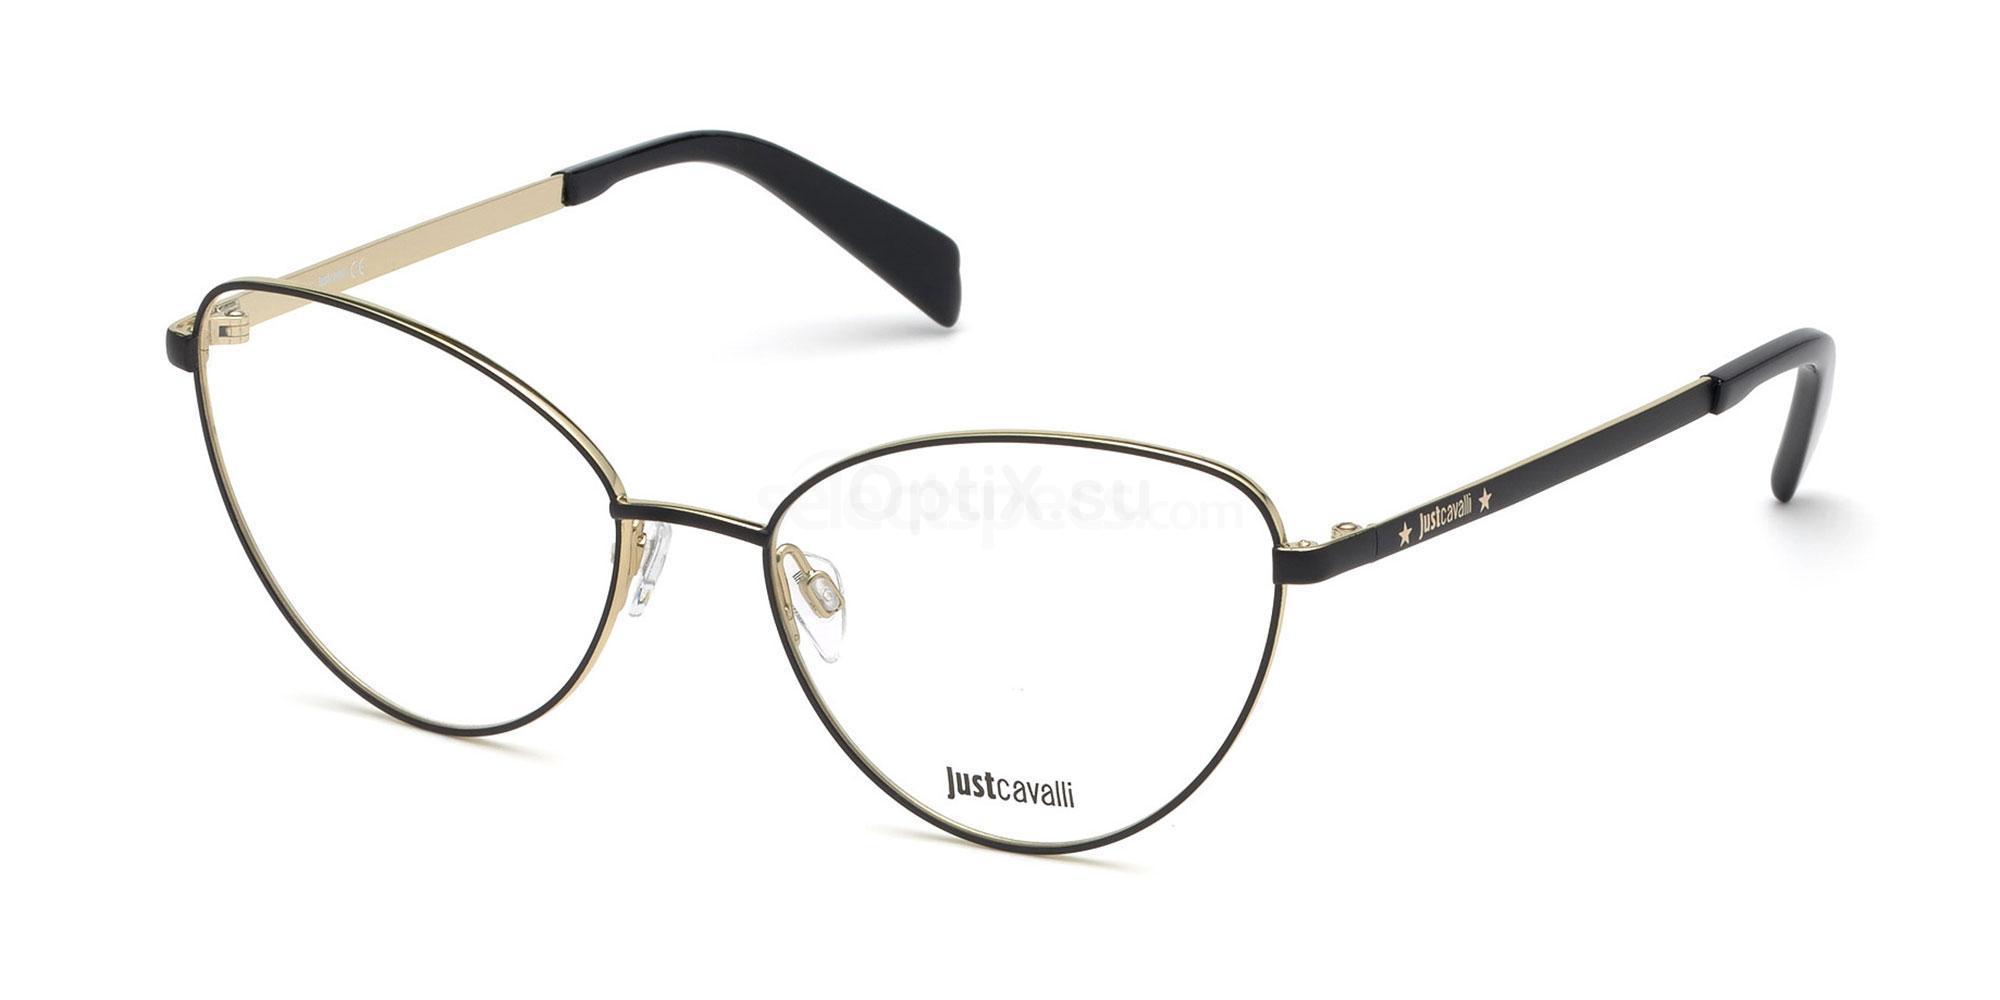 001 JC0882 Glasses, Just Cavalli